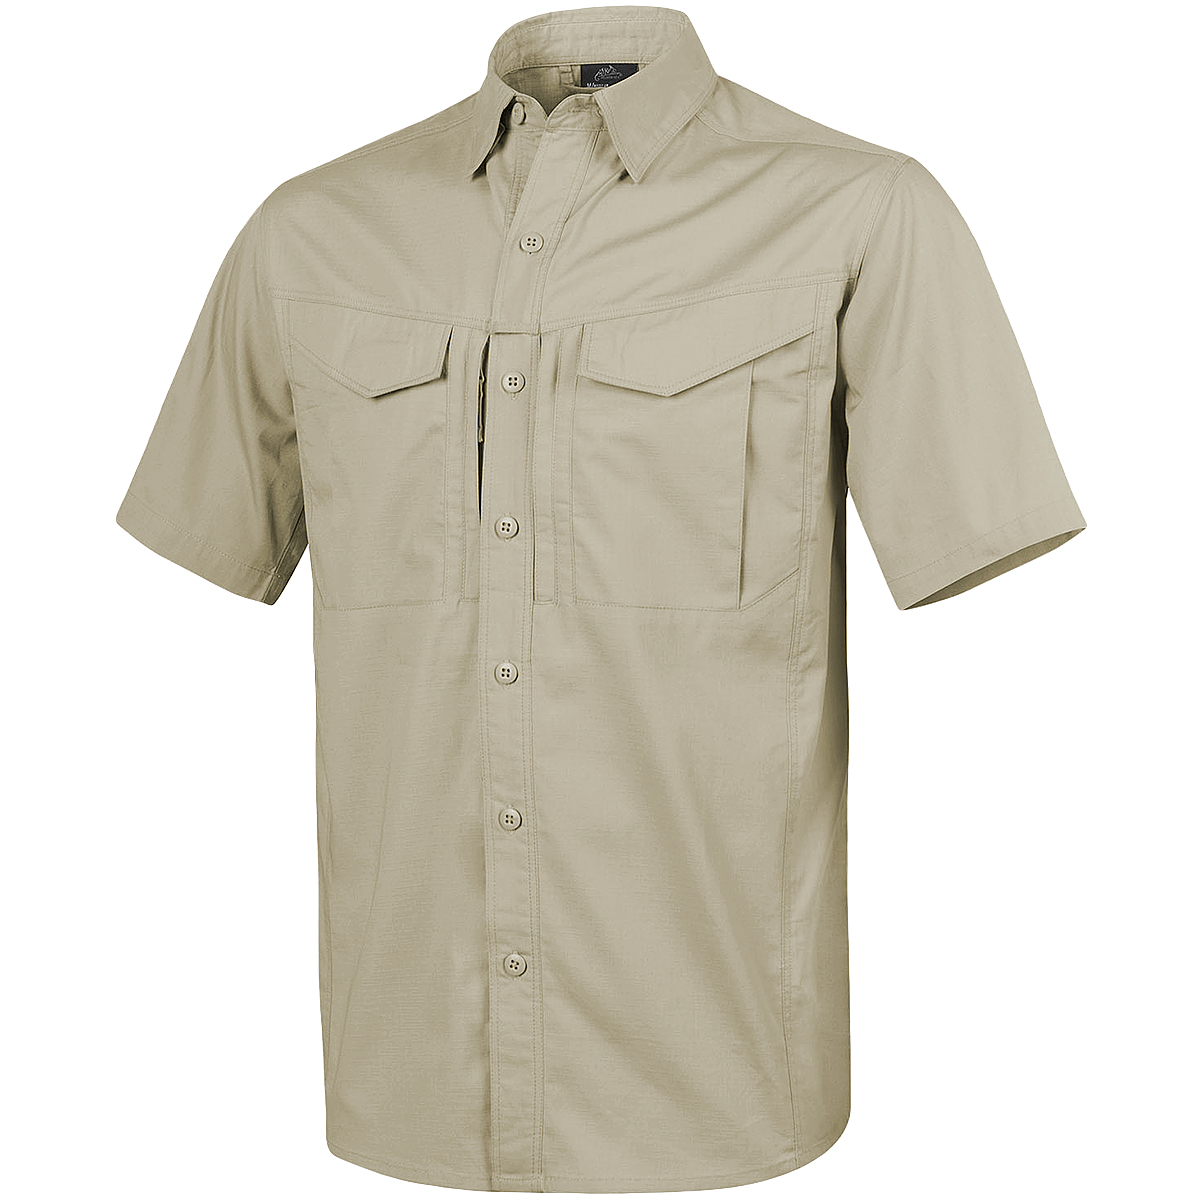 Menu Men's Shirts Men's Pants Men's Shorts Men's Jackets Women's Shirts View All Ski & Snow Menu Jackets Vests Pants Shoes Men's PFG Bahama™ II Short Sleeve Shirt $ - $ Compare. Sale. ADA-Form-Label Quick Shop. ADA-Form-Label Compare.